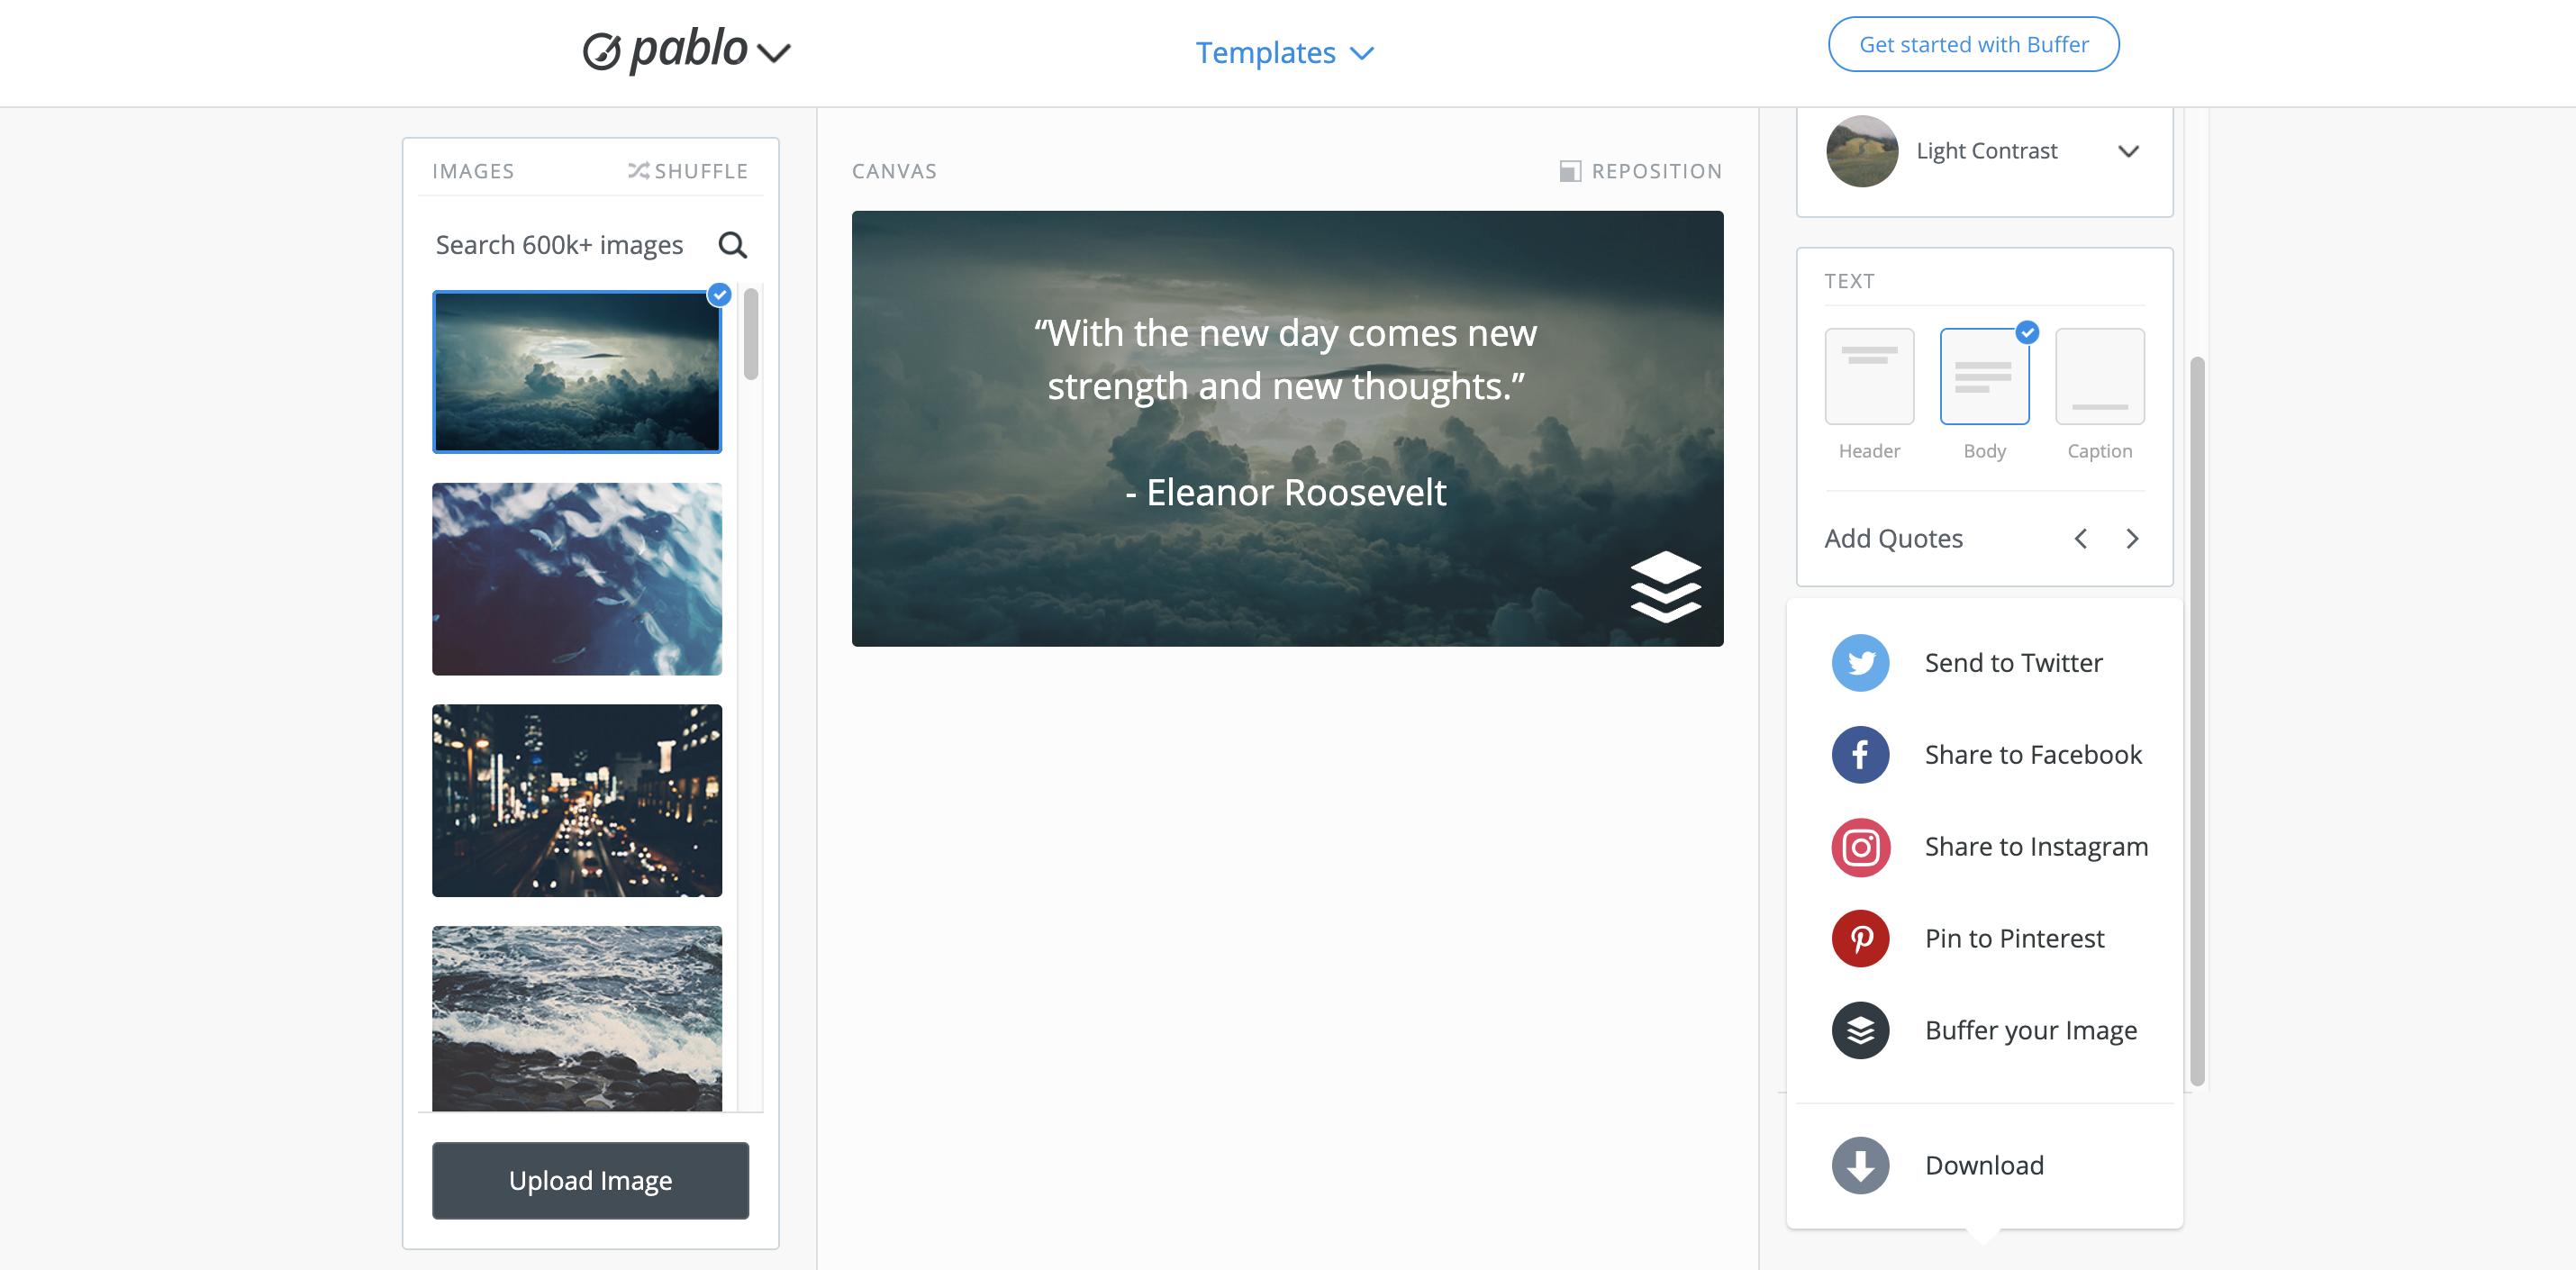 Publish] Creating social media images using Pablo - Buffer FAQ